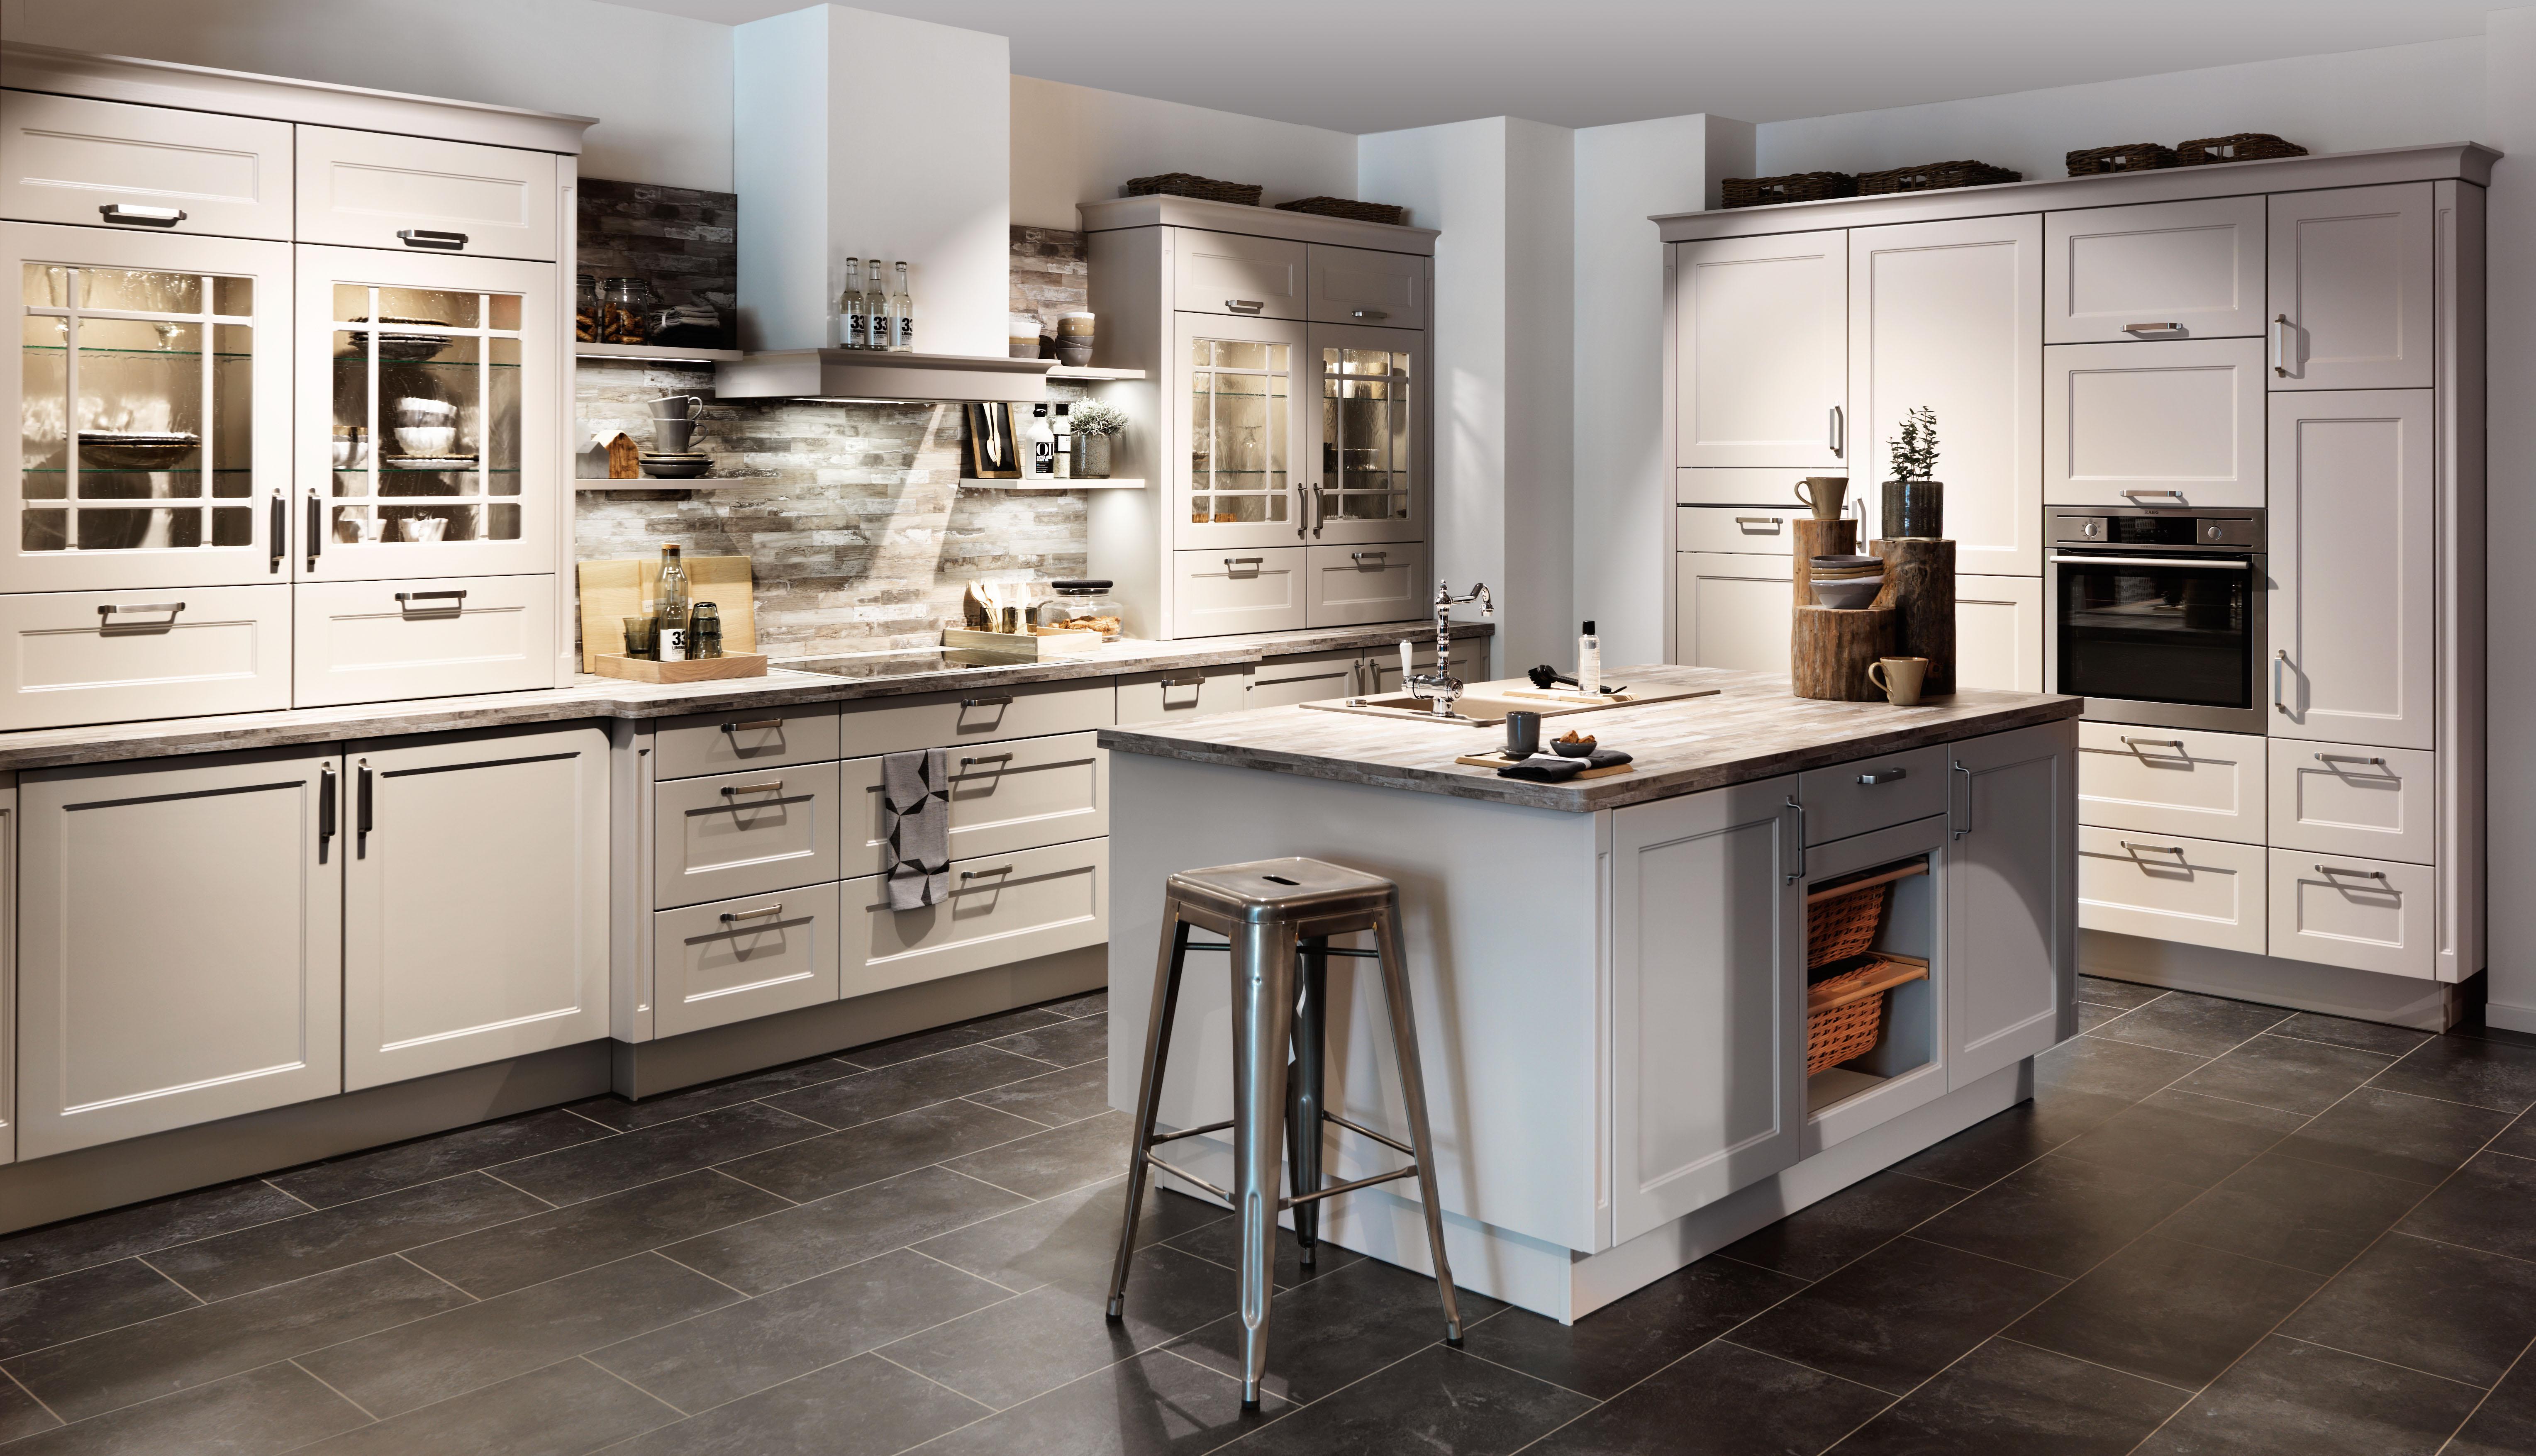 haus garten in hamburg infobel deutschland. Black Bedroom Furniture Sets. Home Design Ideas